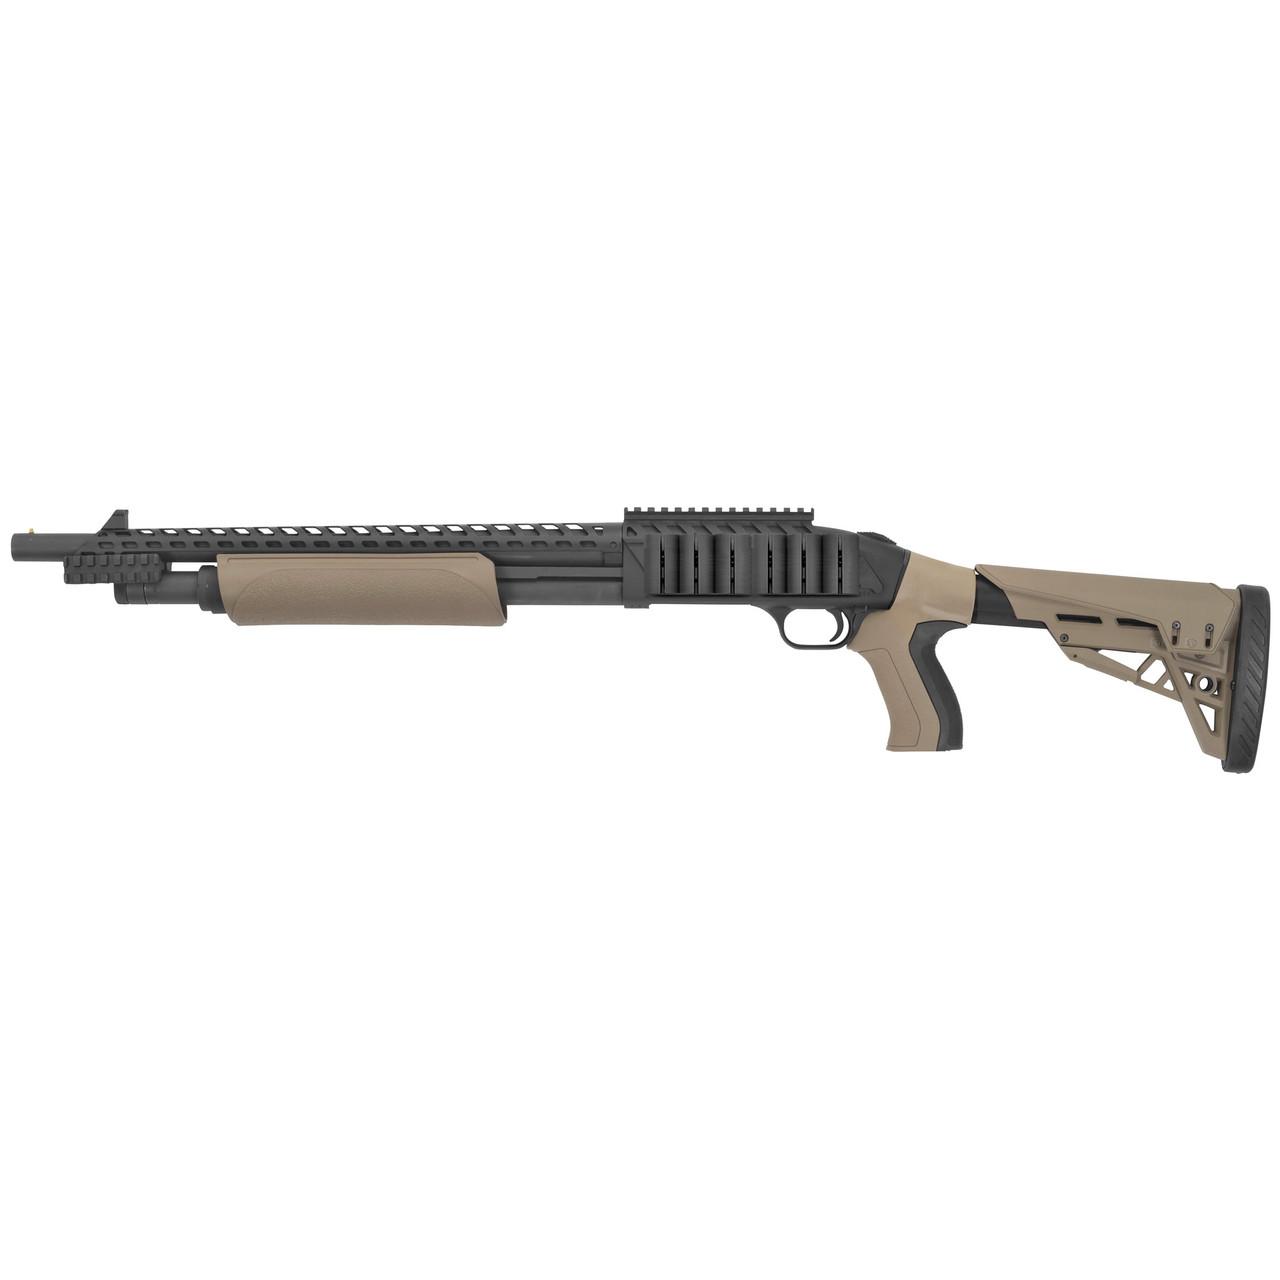 Mossberg 500 w/ Scorpion Grip TALO Exclusive CALIFORNIA LEGAL - 12ga - FDE